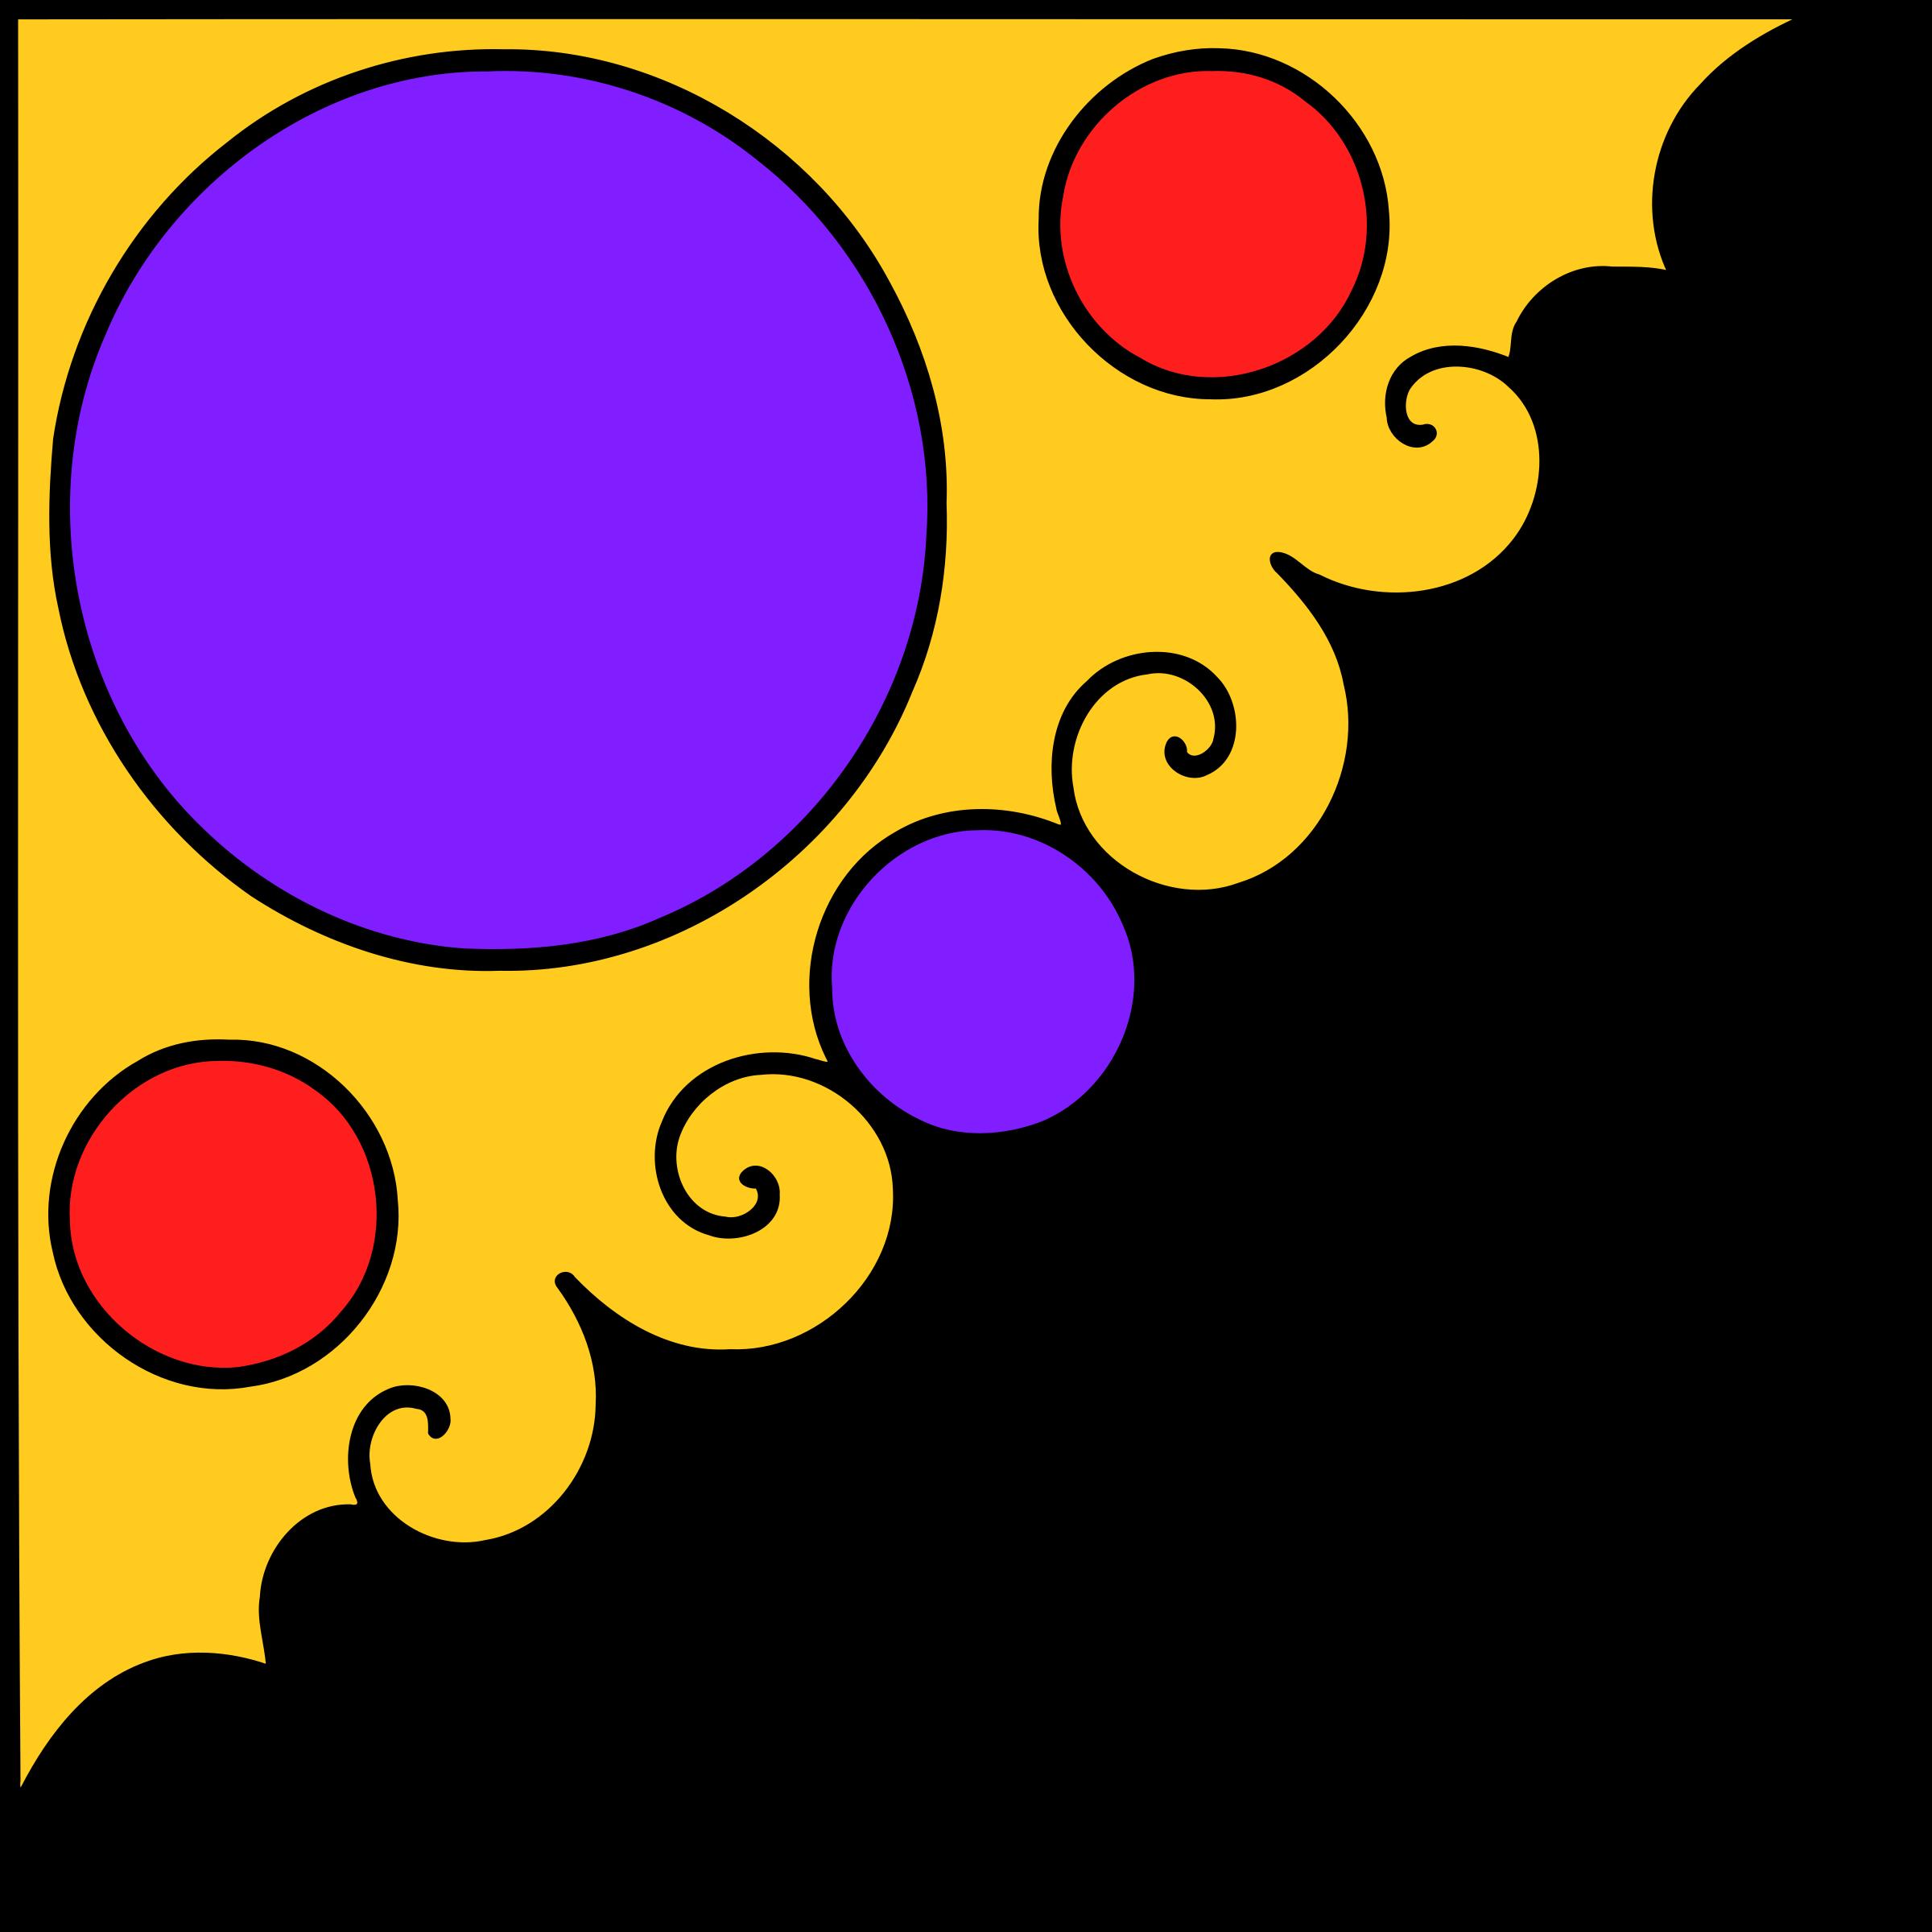 Purple clipart corner. Decorative big image png